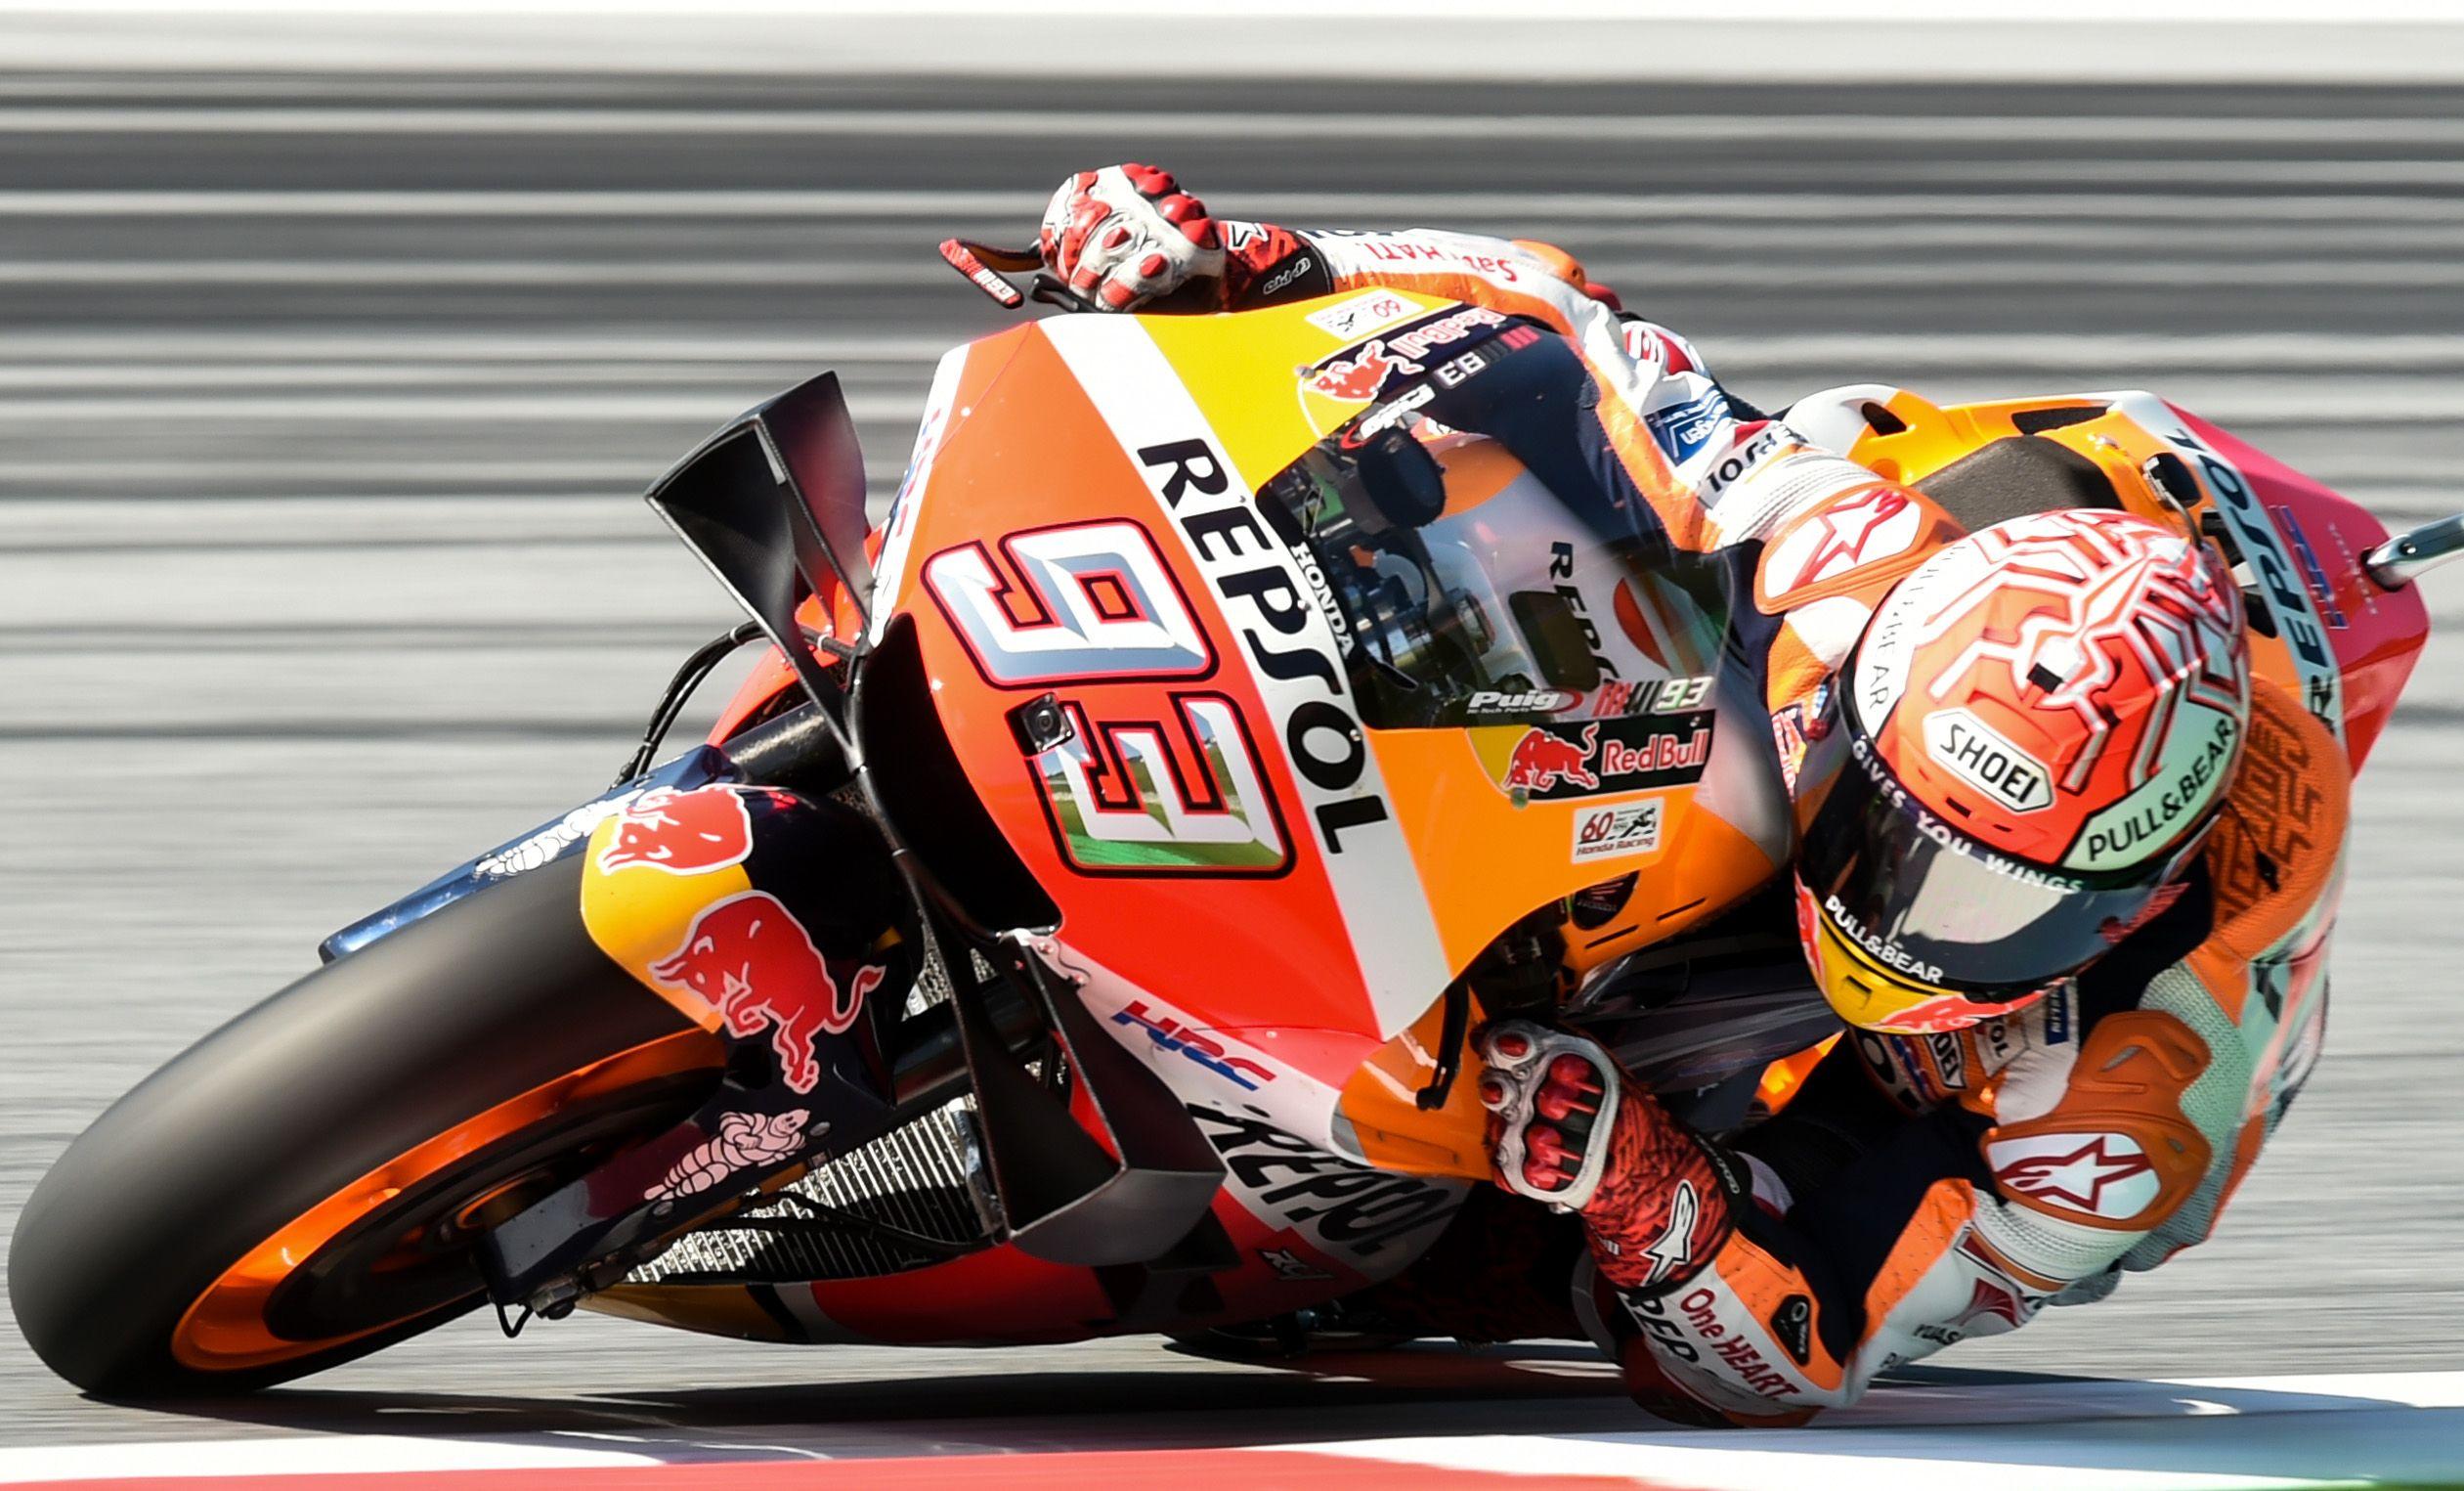 Marc Marquez racing his motorcycle